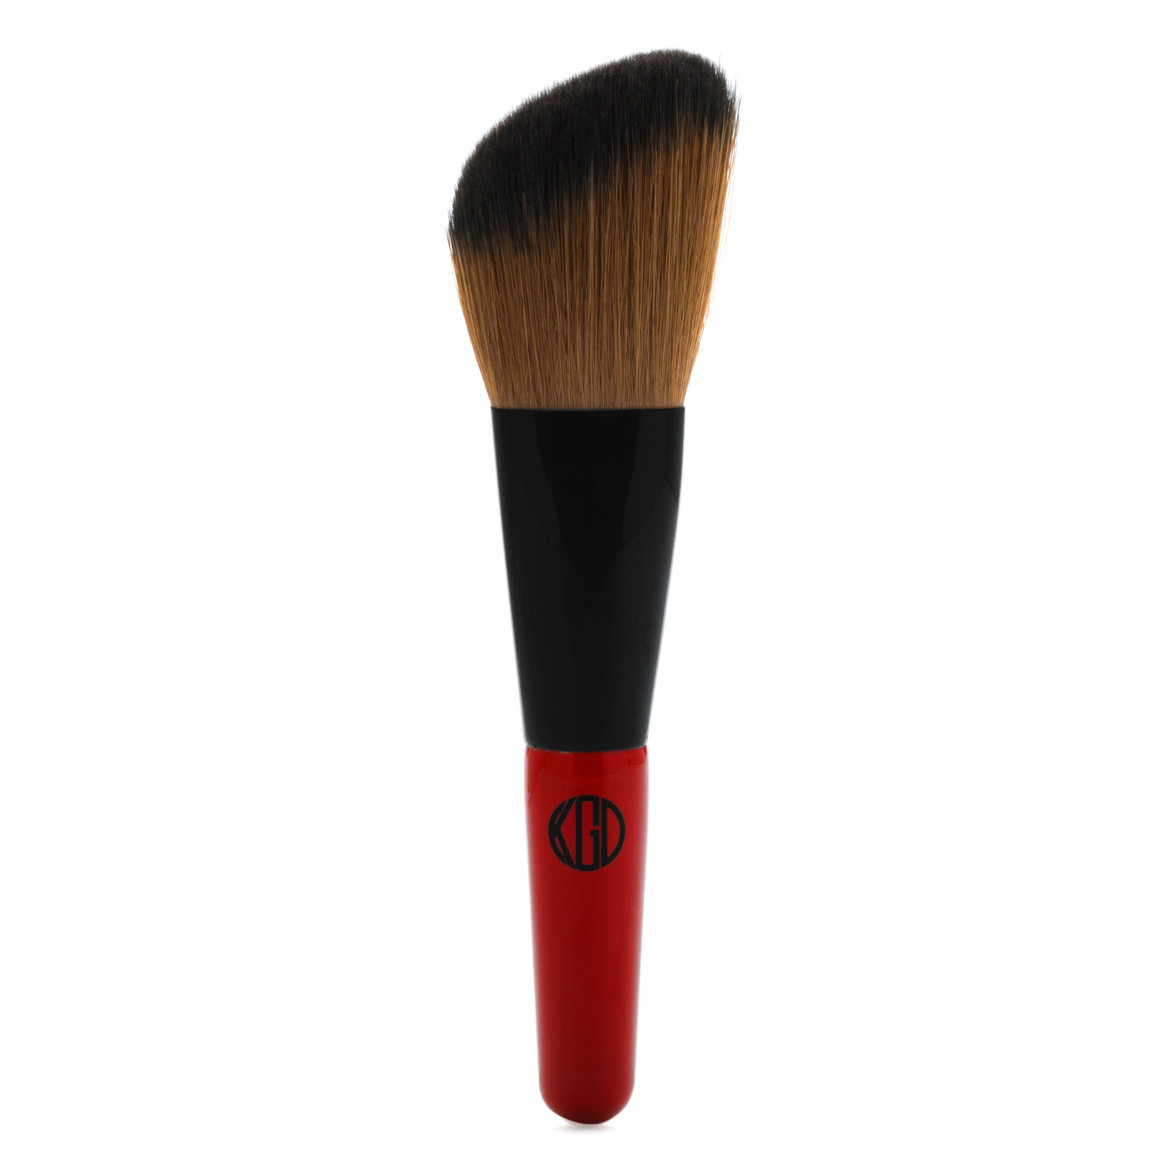 Koh Gen Do Shading Brush product swatch.